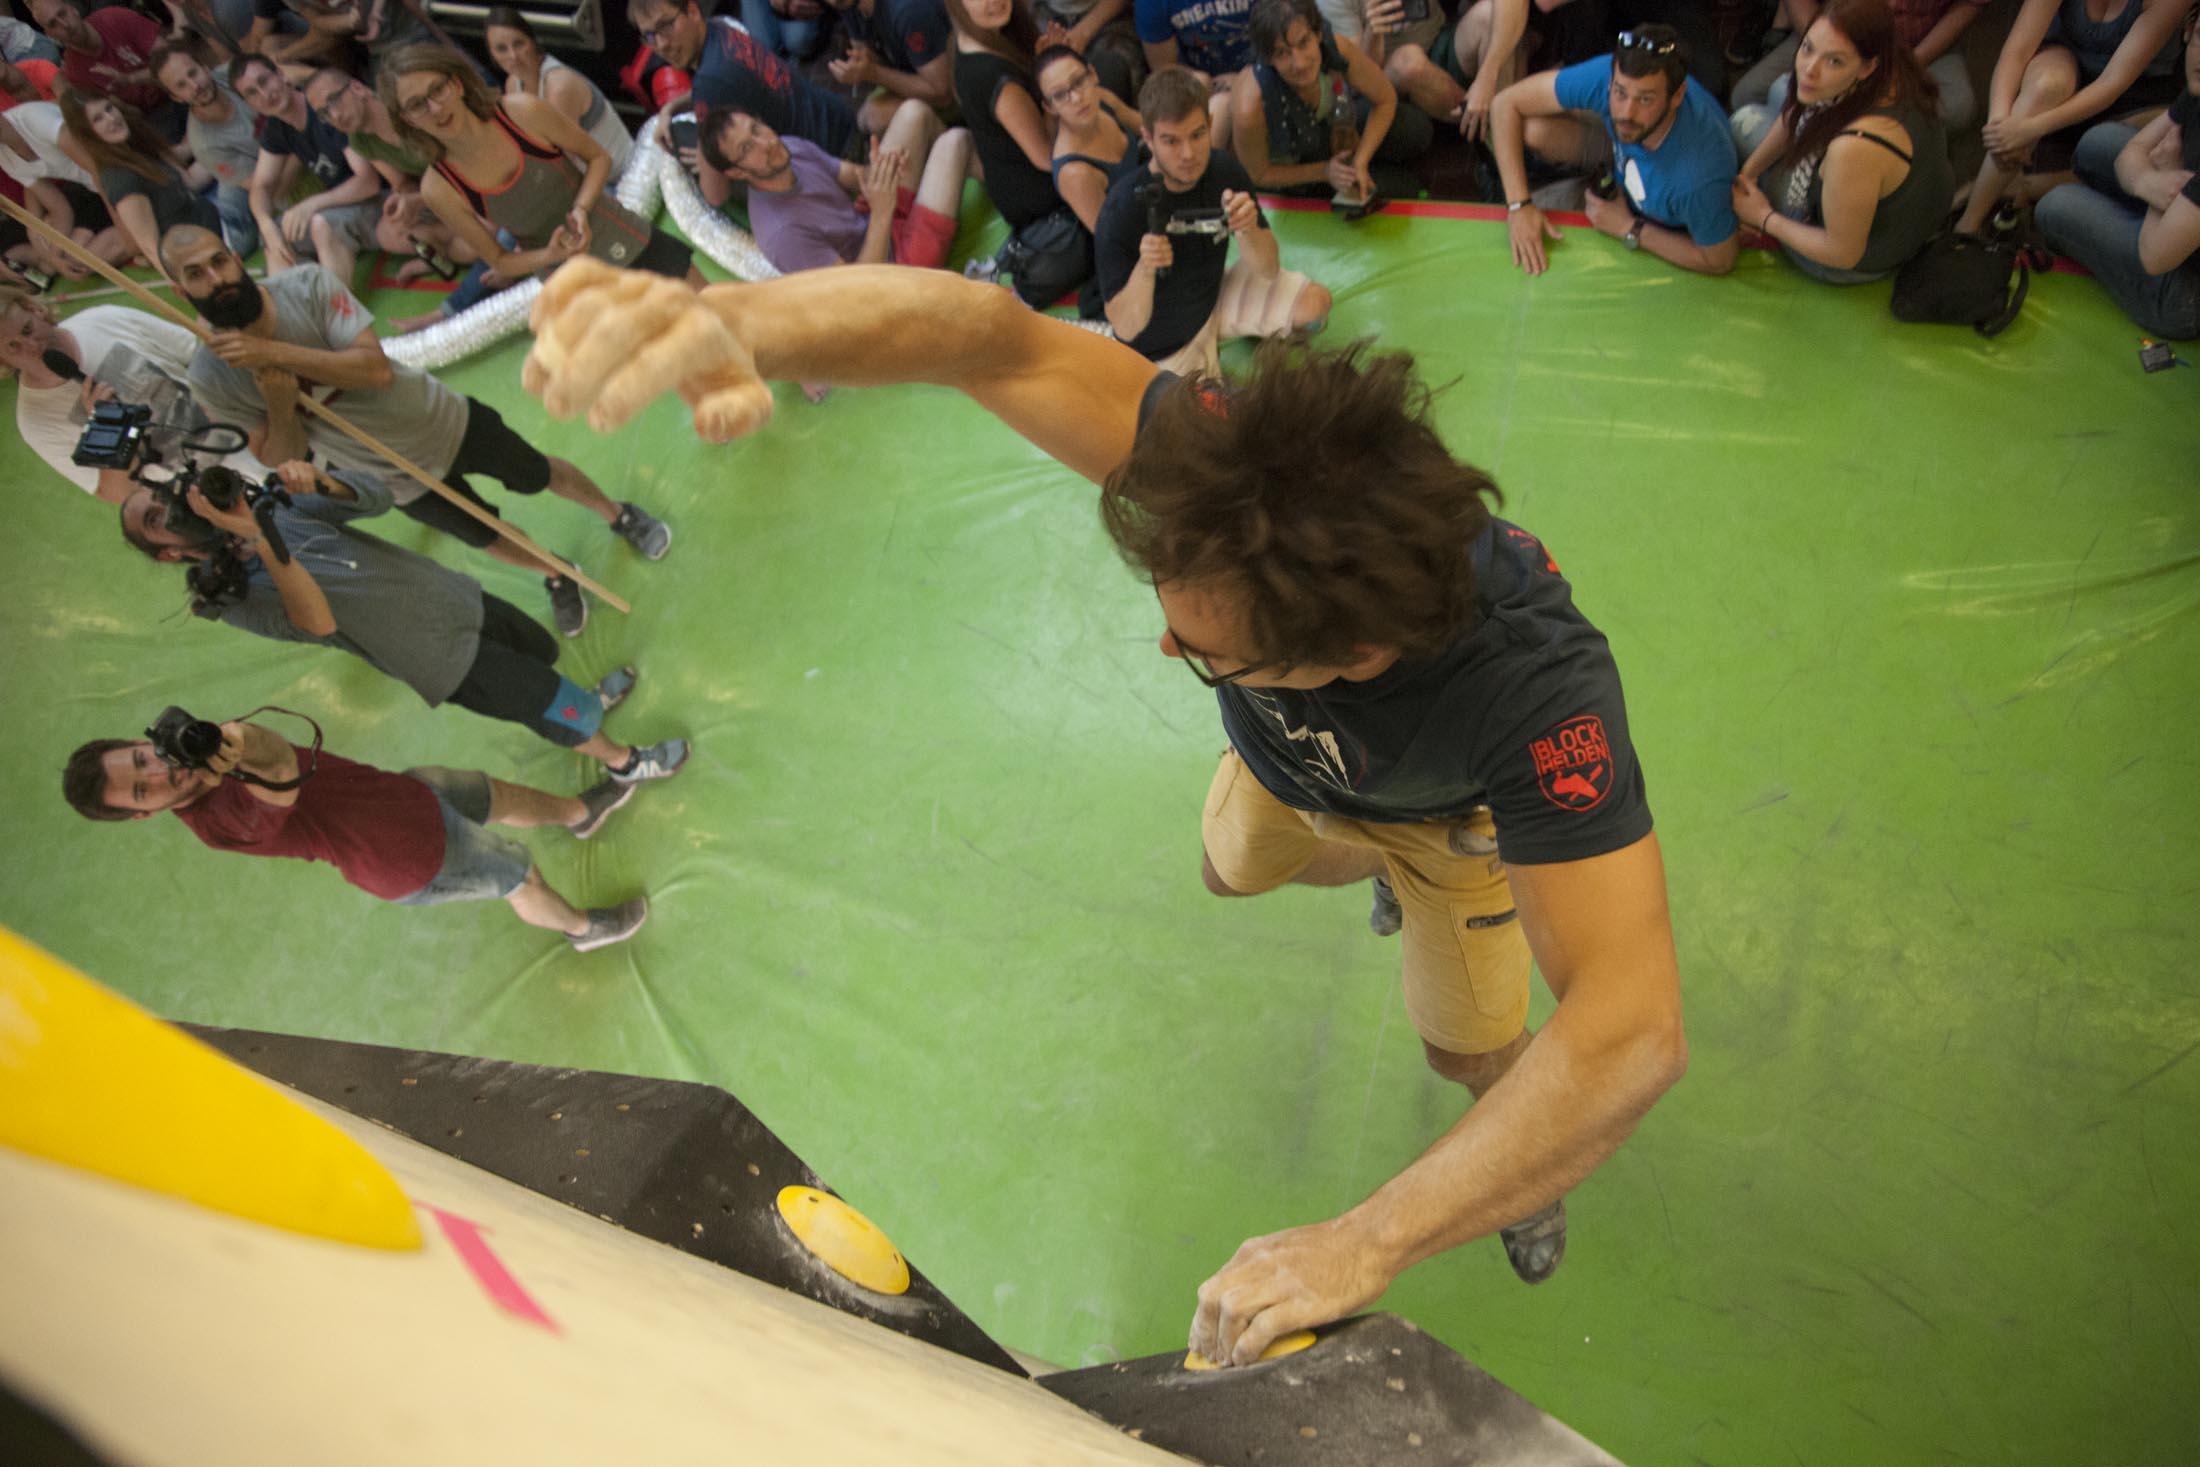 Finale, internationaler bouldercup Frankenjura 2016, BLOCKHELDEN Erlangen, Mammut, Bergfreunde.de, Boulderwettkampf07092016474